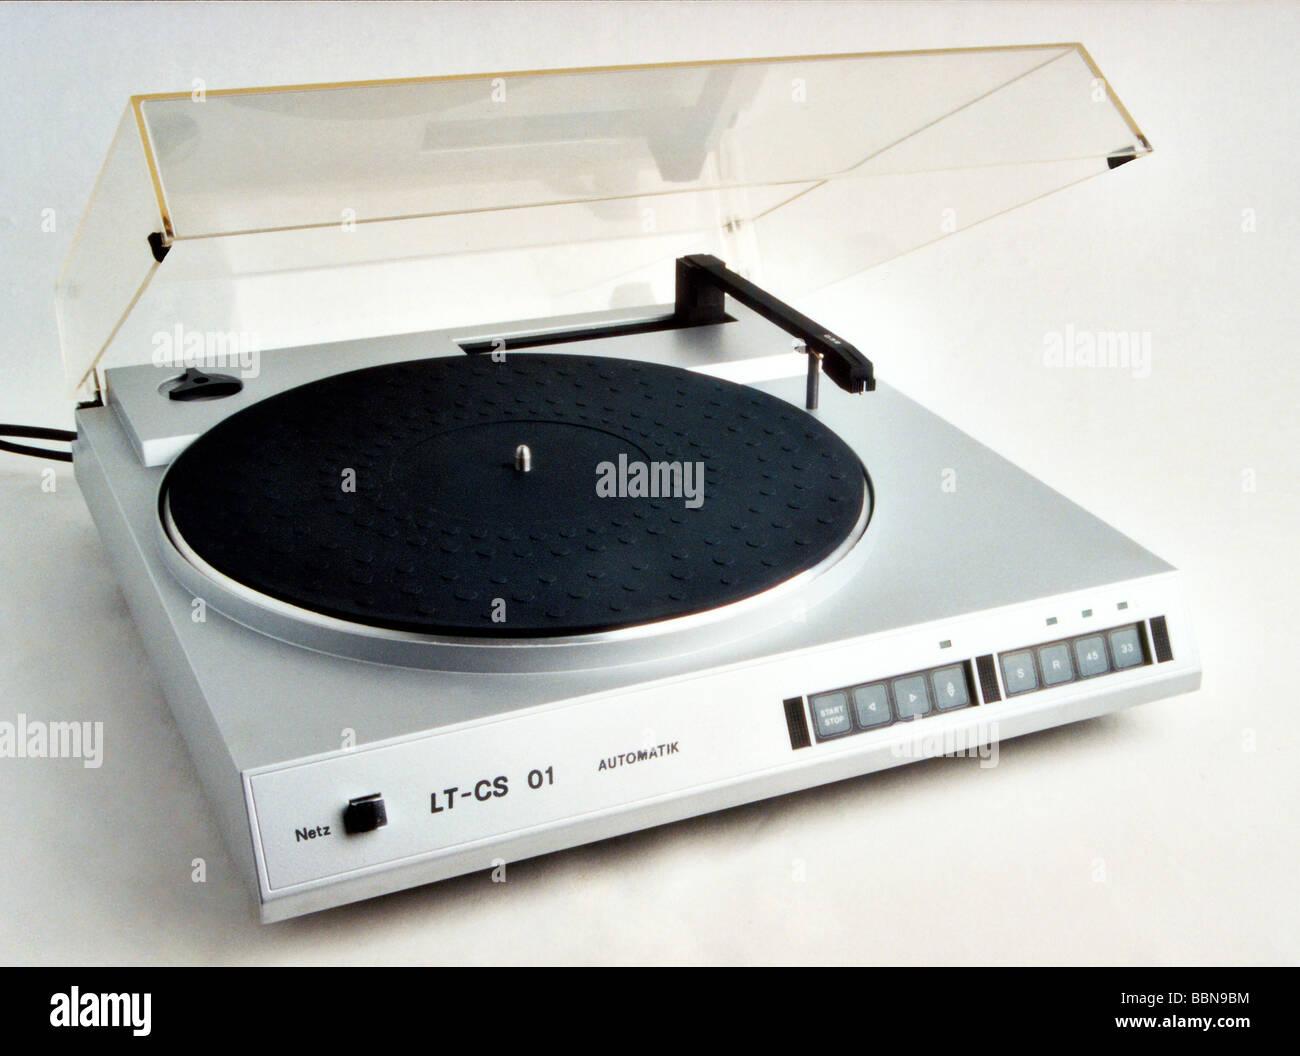 technics, record player, tangential record player LT-CS 01, made by VEB Elektronische Bauelemente Teltow, GDR, 1986, - Stock Image